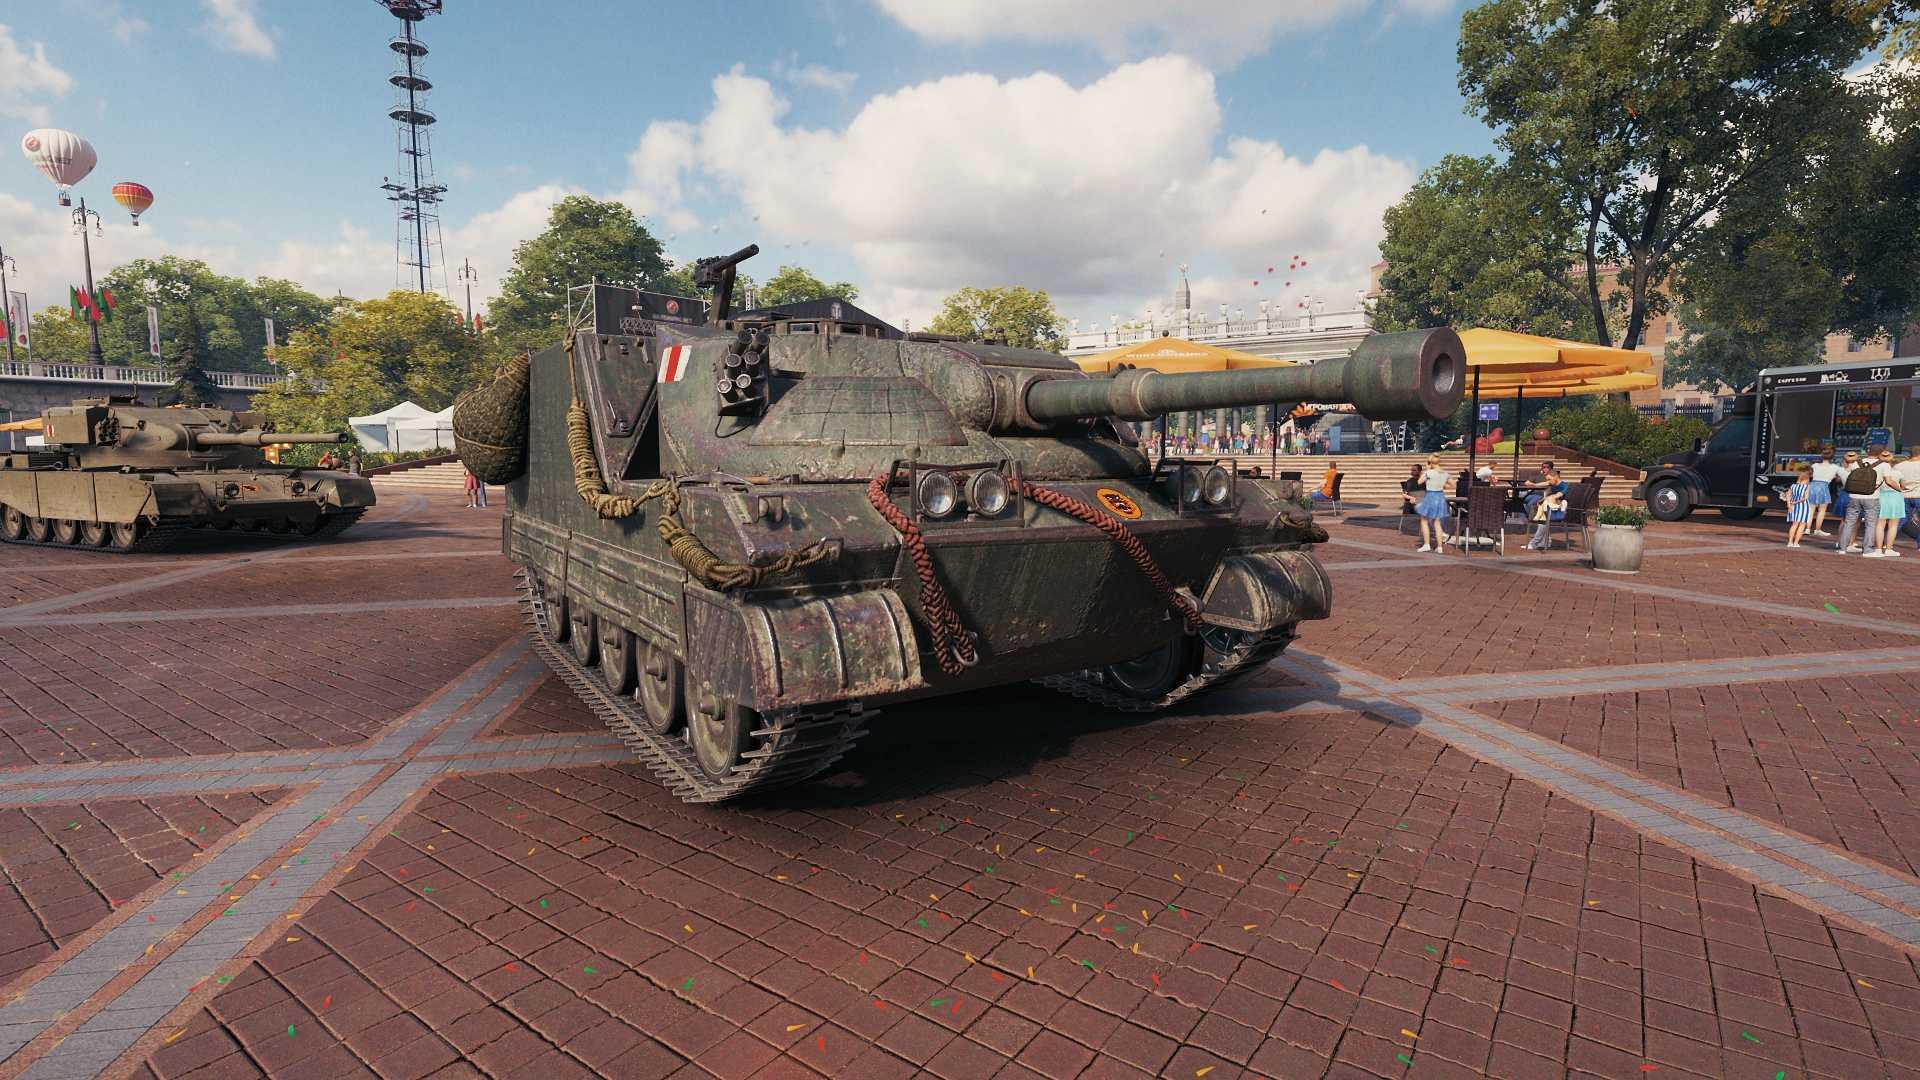 World of Tanks - Gamescom garage - day and night   MMOWG net